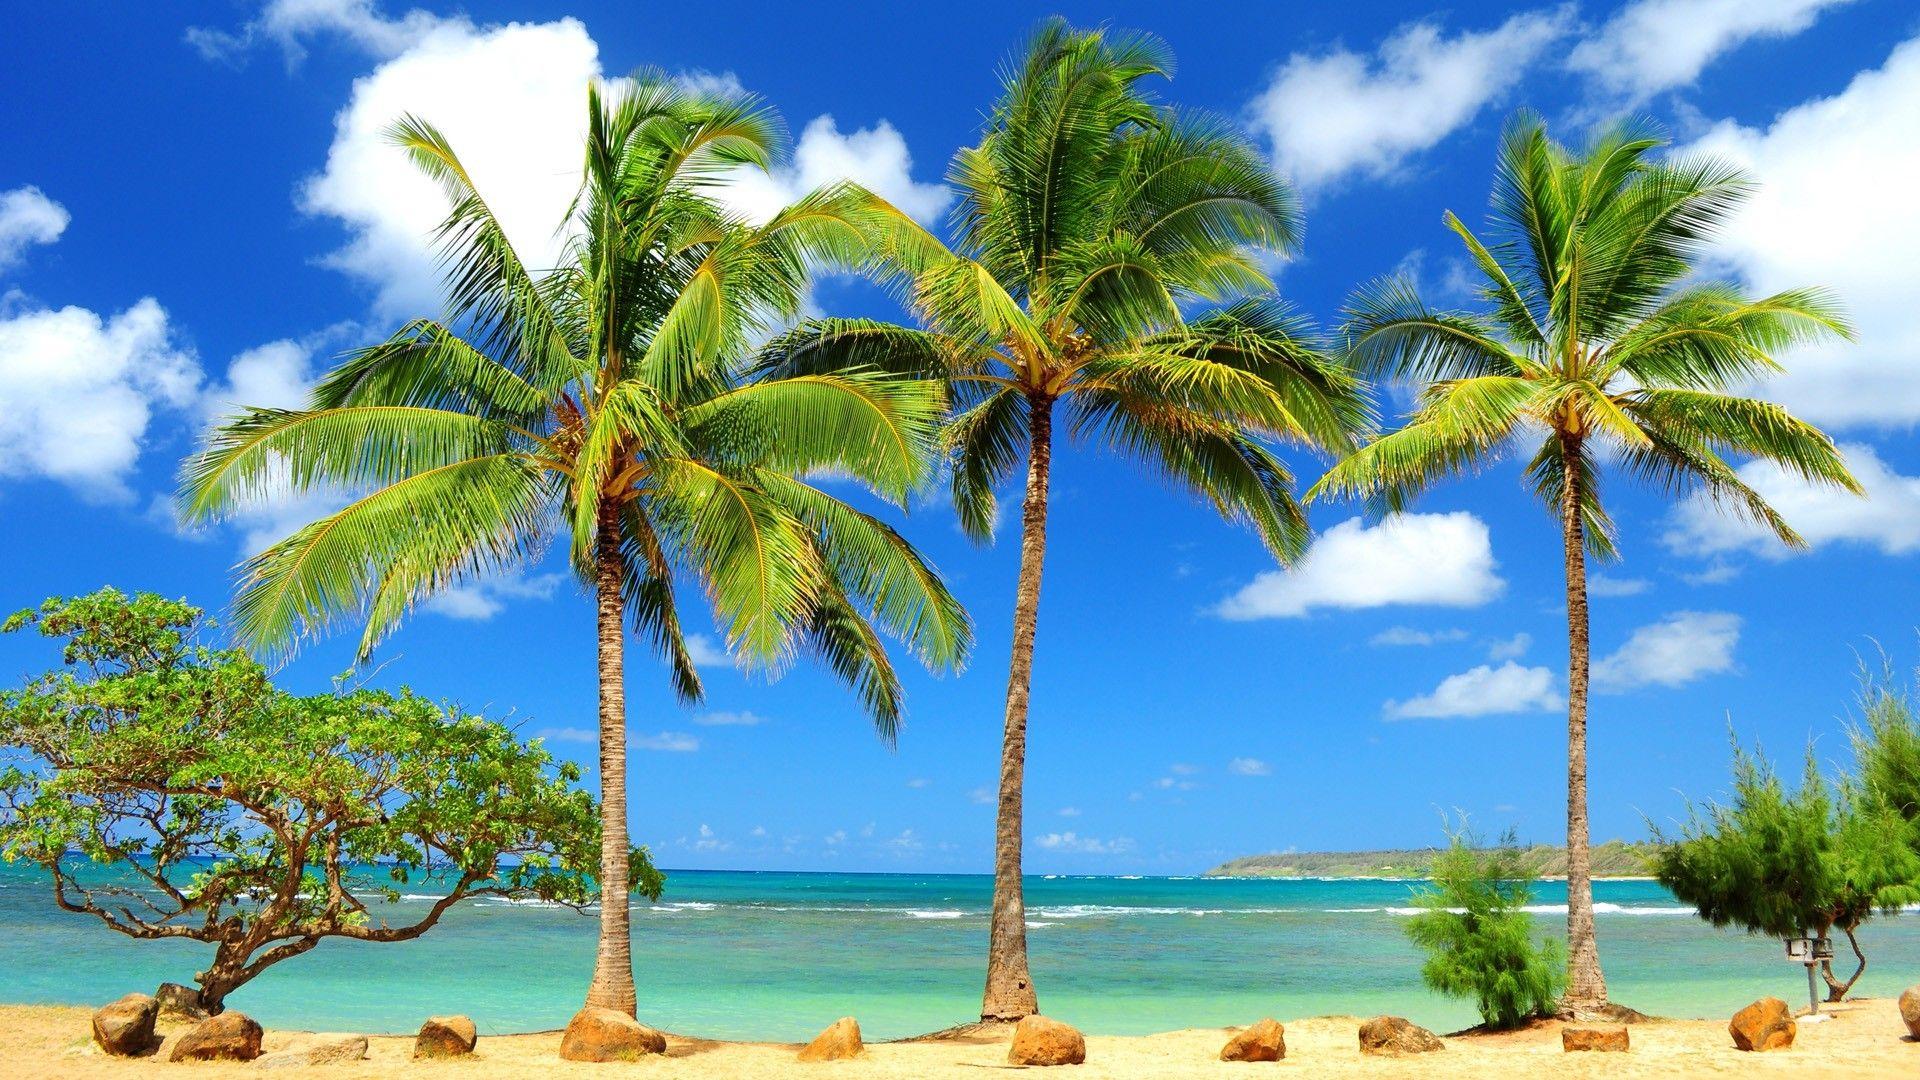 Free Hawaii Wallpaper Free Palm Trees Wallpaper